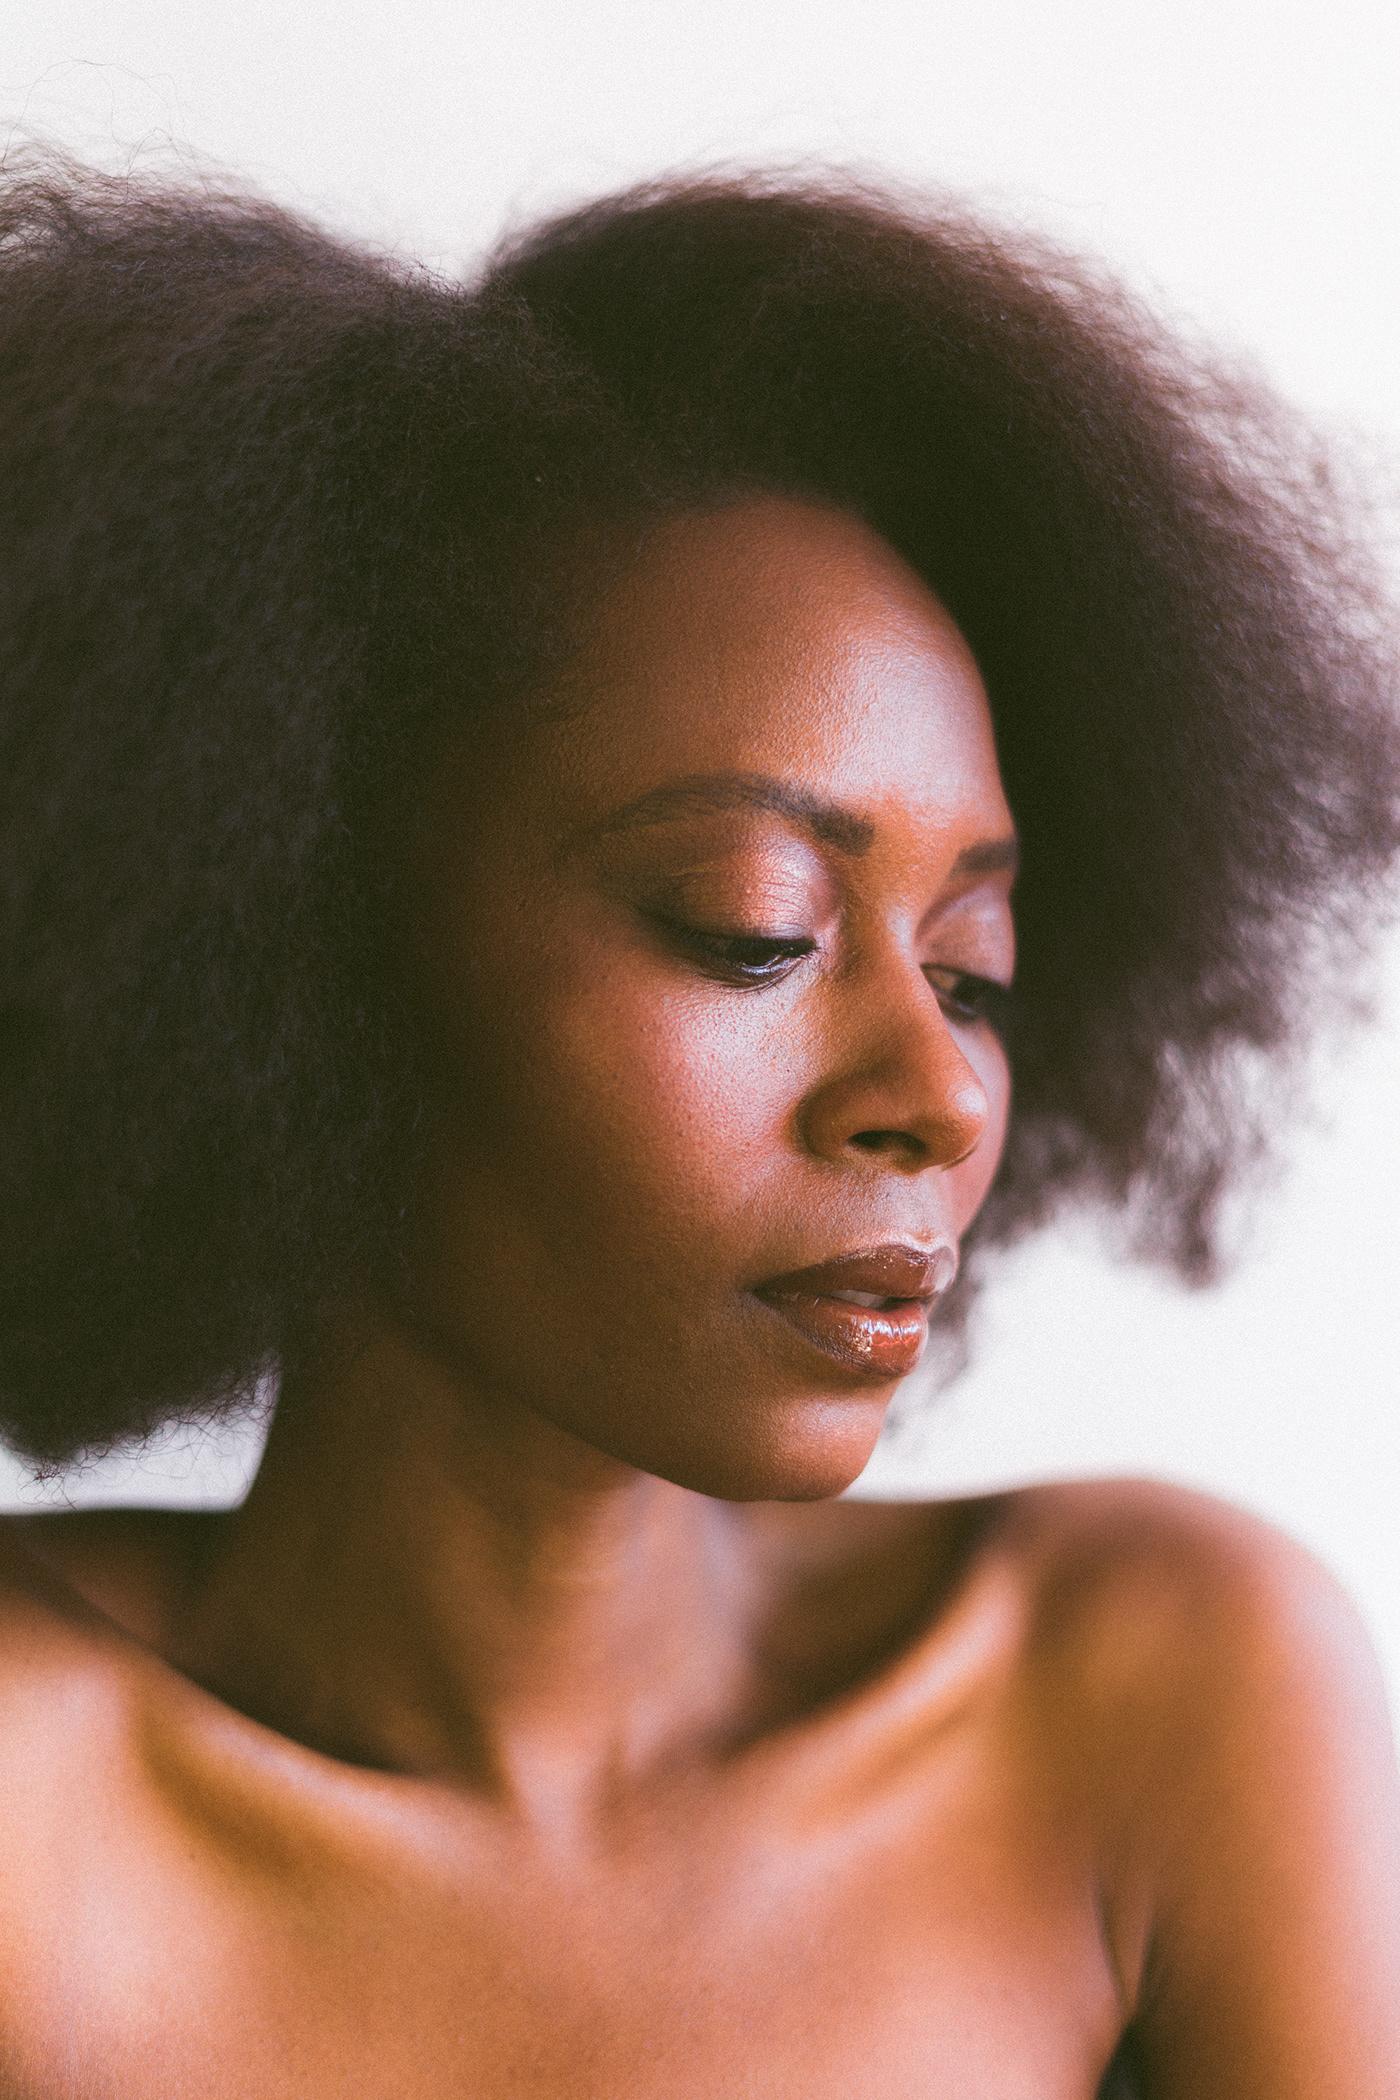 afro Afro Girl brown makeup dark skin Fashion  fashion shoot makeup model photoshoot portrait